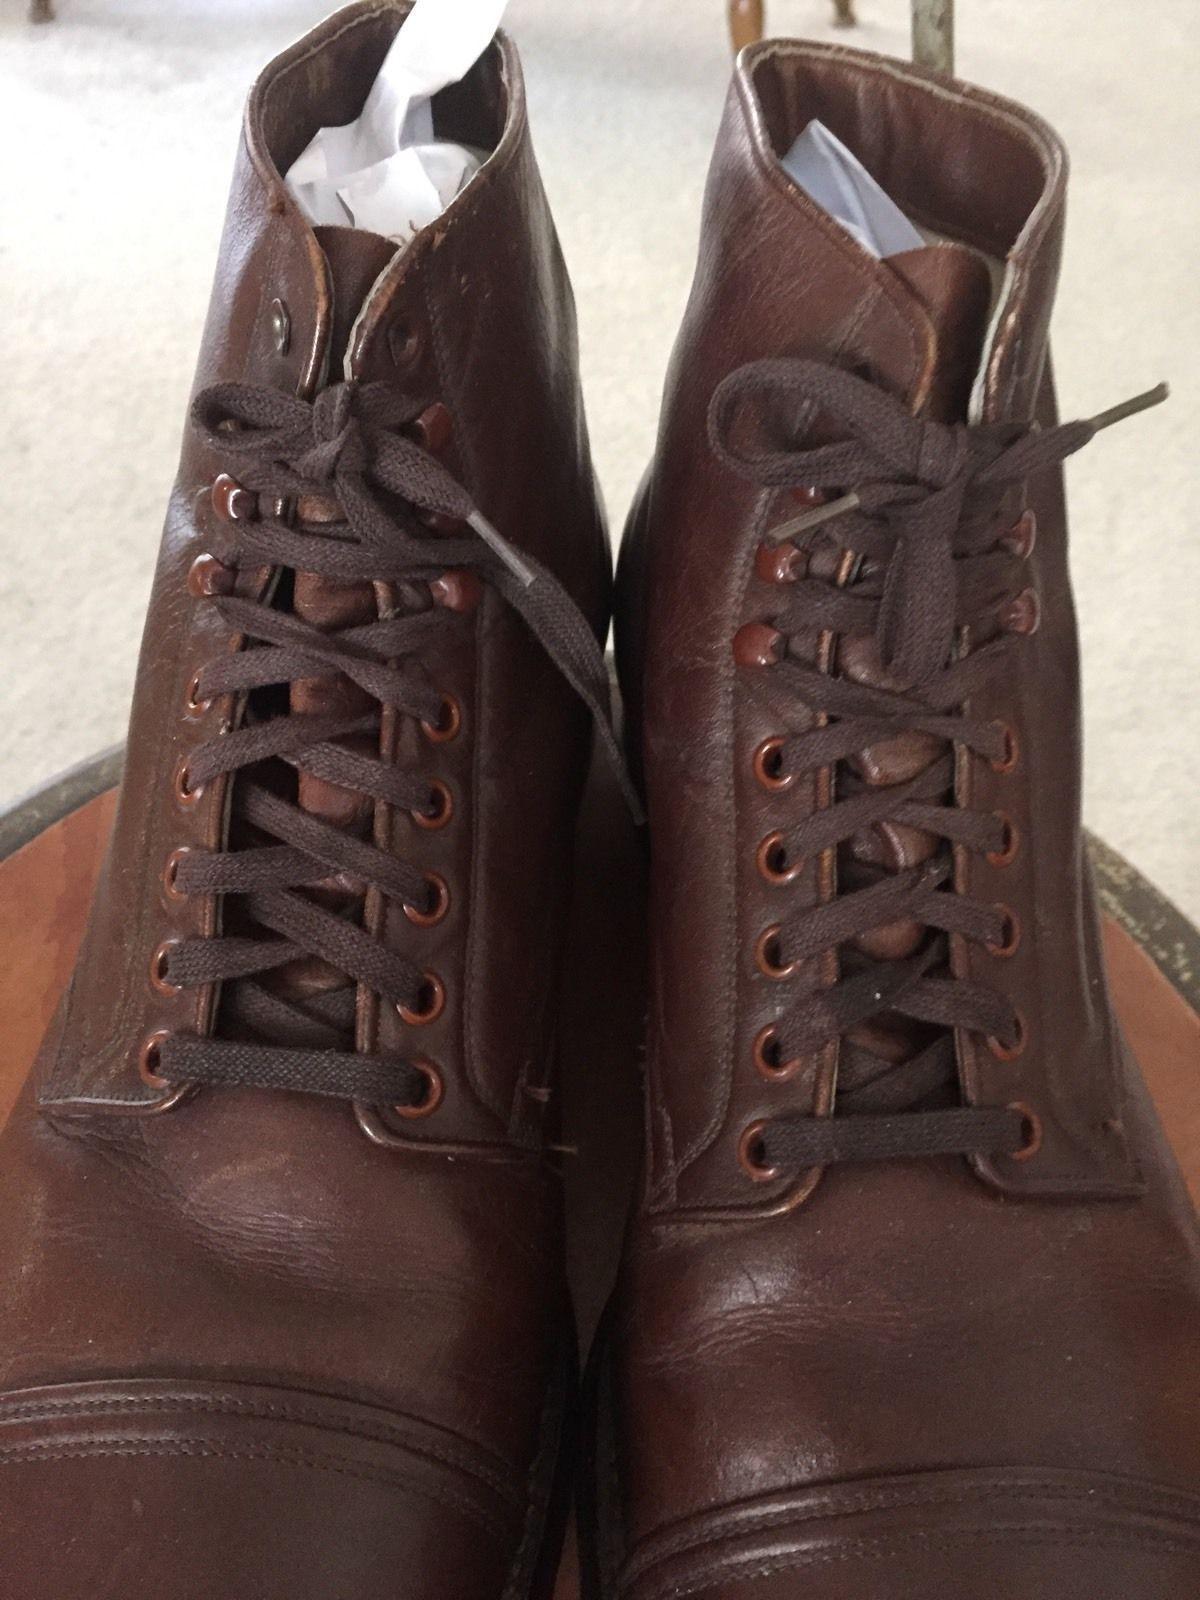 in Clothing, Shoes & Accessories, Vintage, Men's Vintage